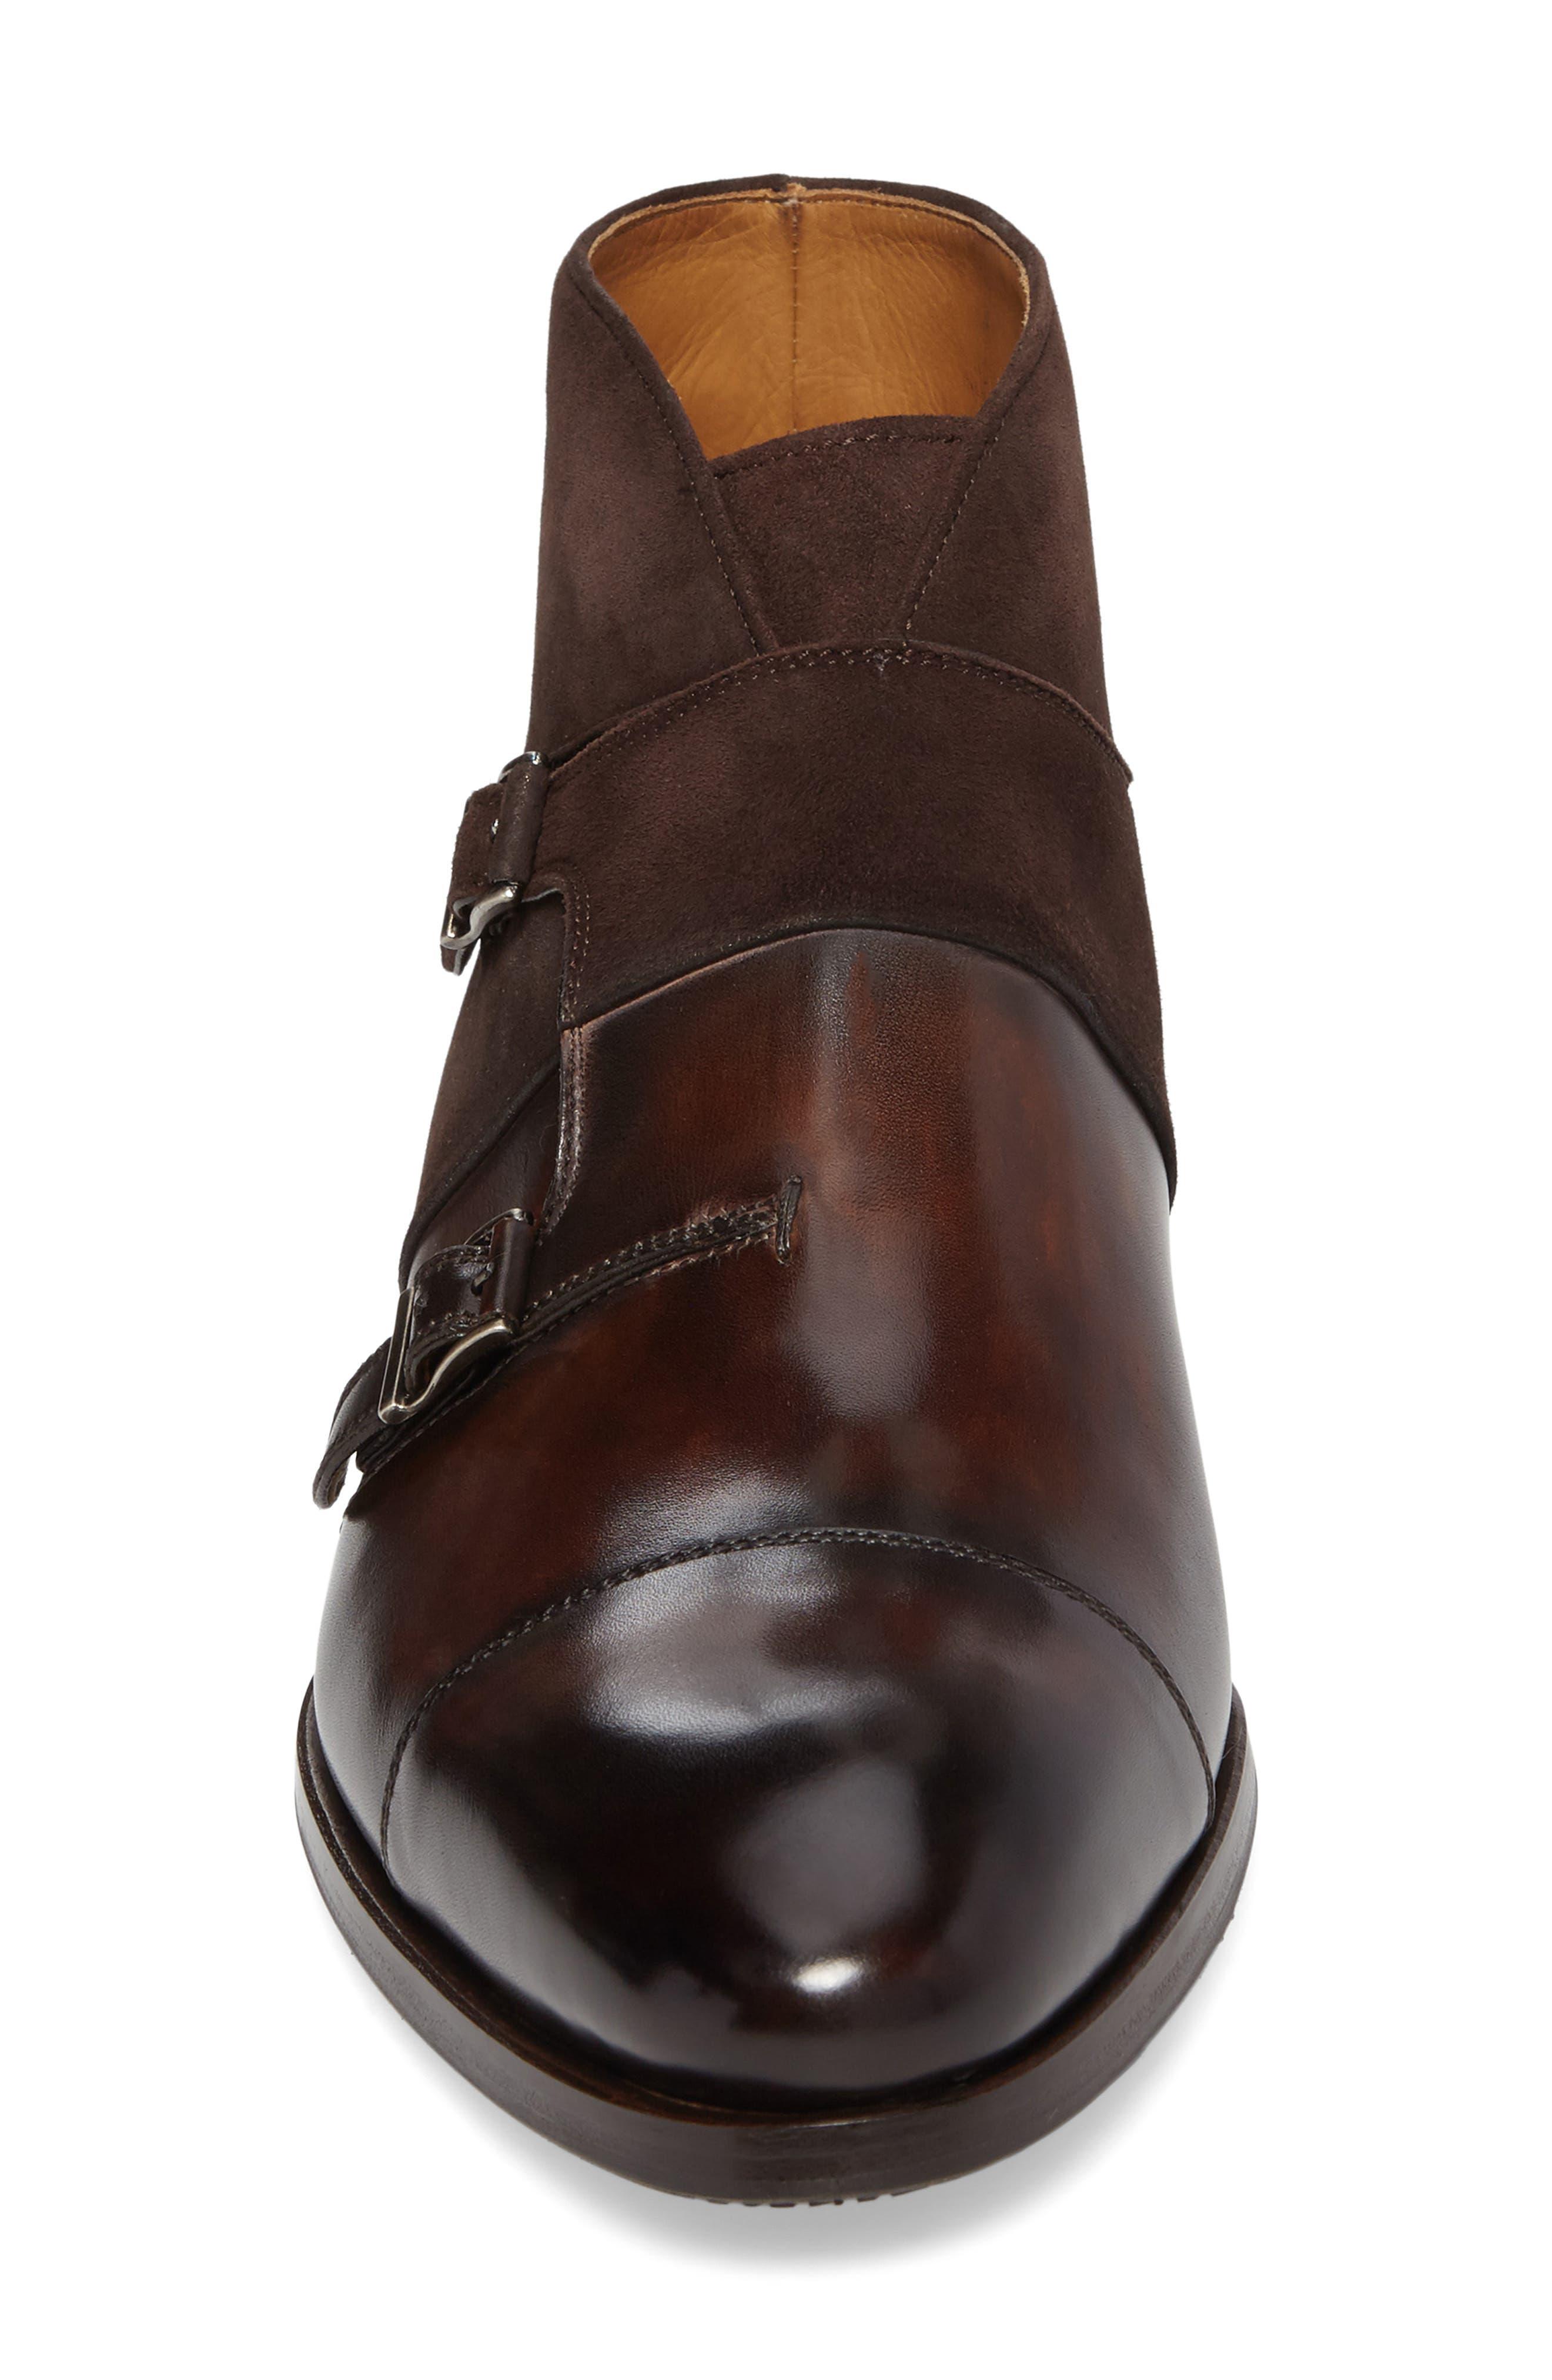 Octavian Double Monk Strap Boot,                             Alternate thumbnail 4, color,                             200